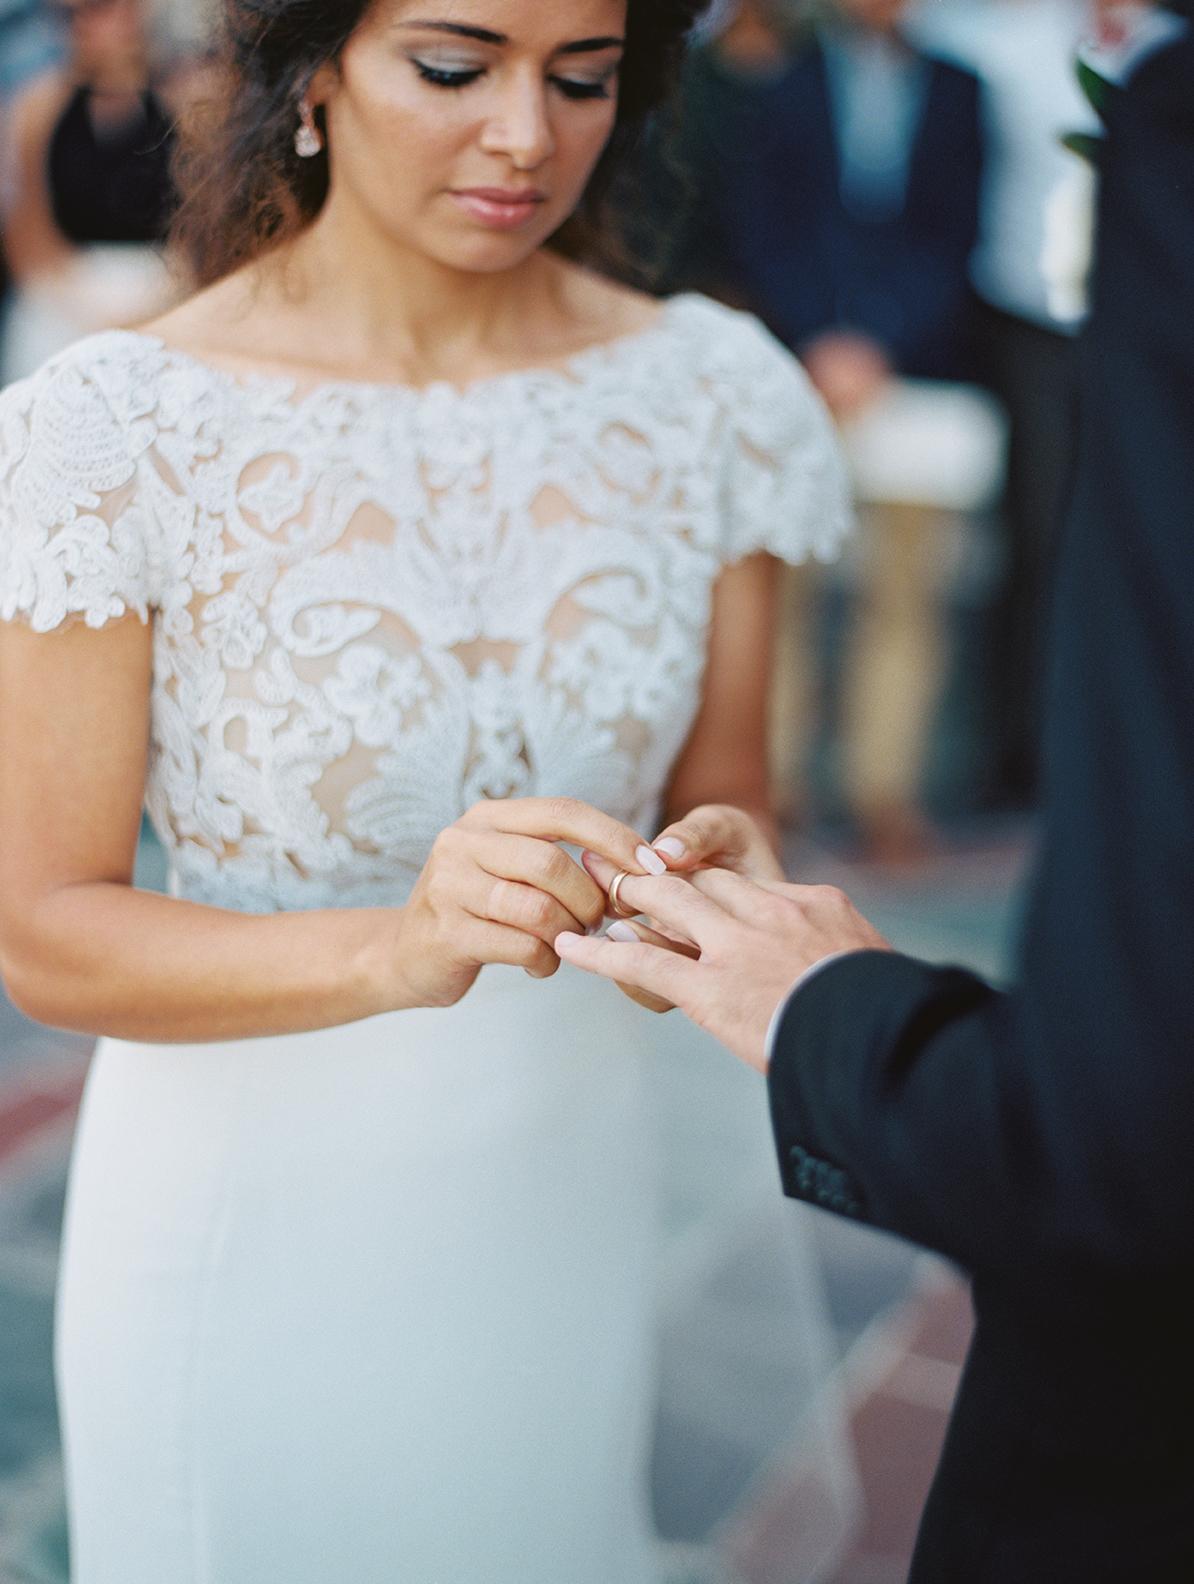 194-brian-sarra-los-angeles-wedding-brumley-wells-photography.jpg